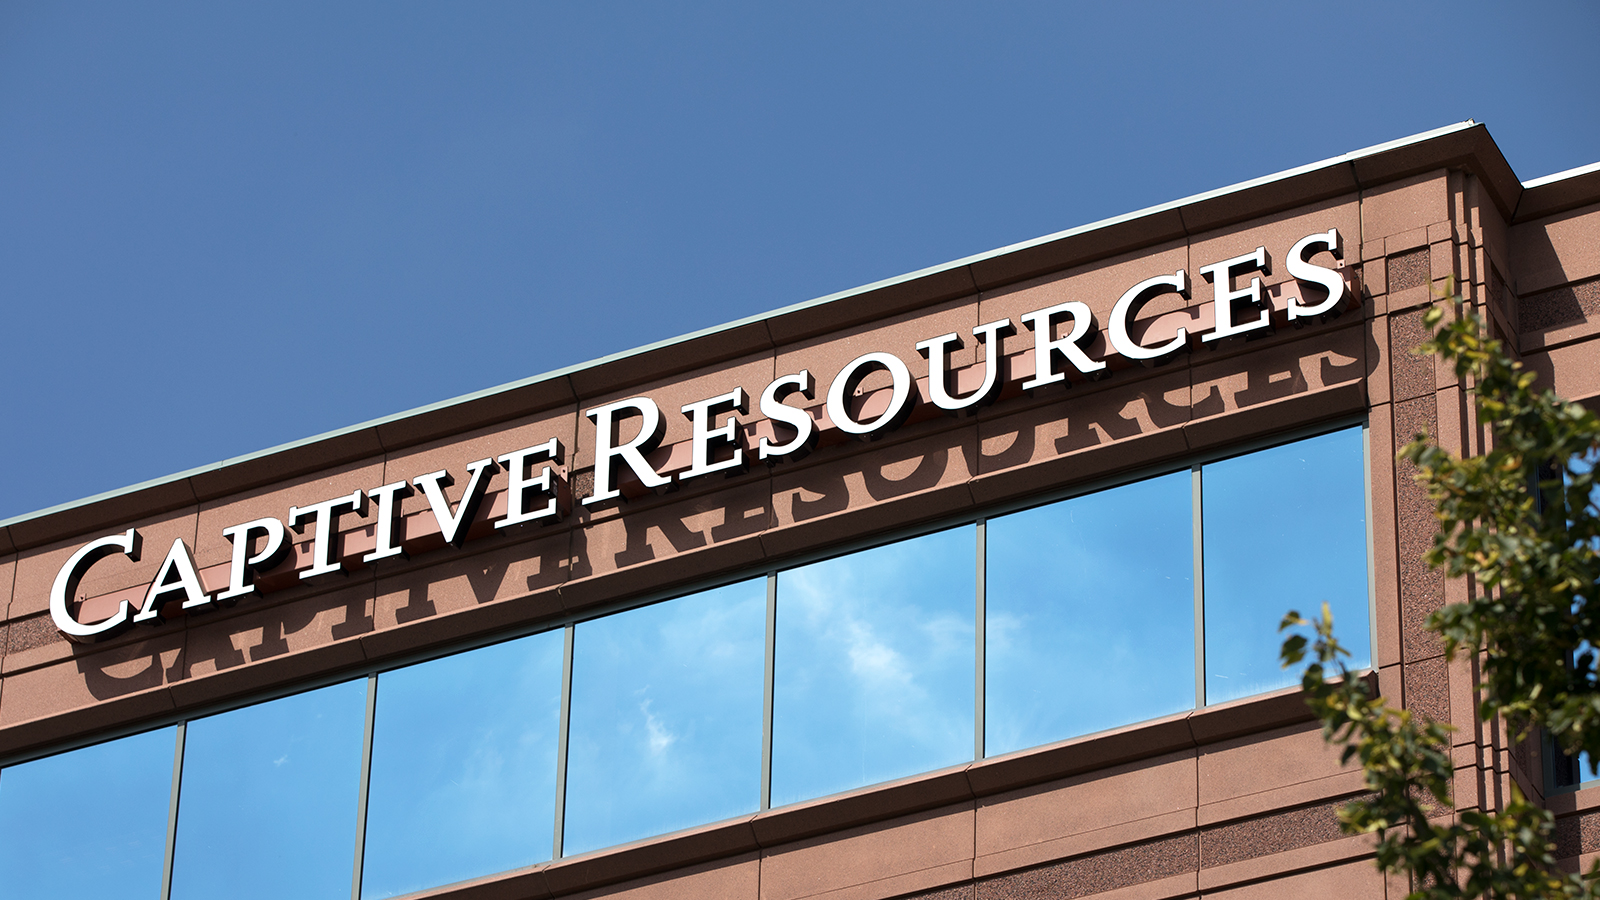 Exterior of Captive Resources Building